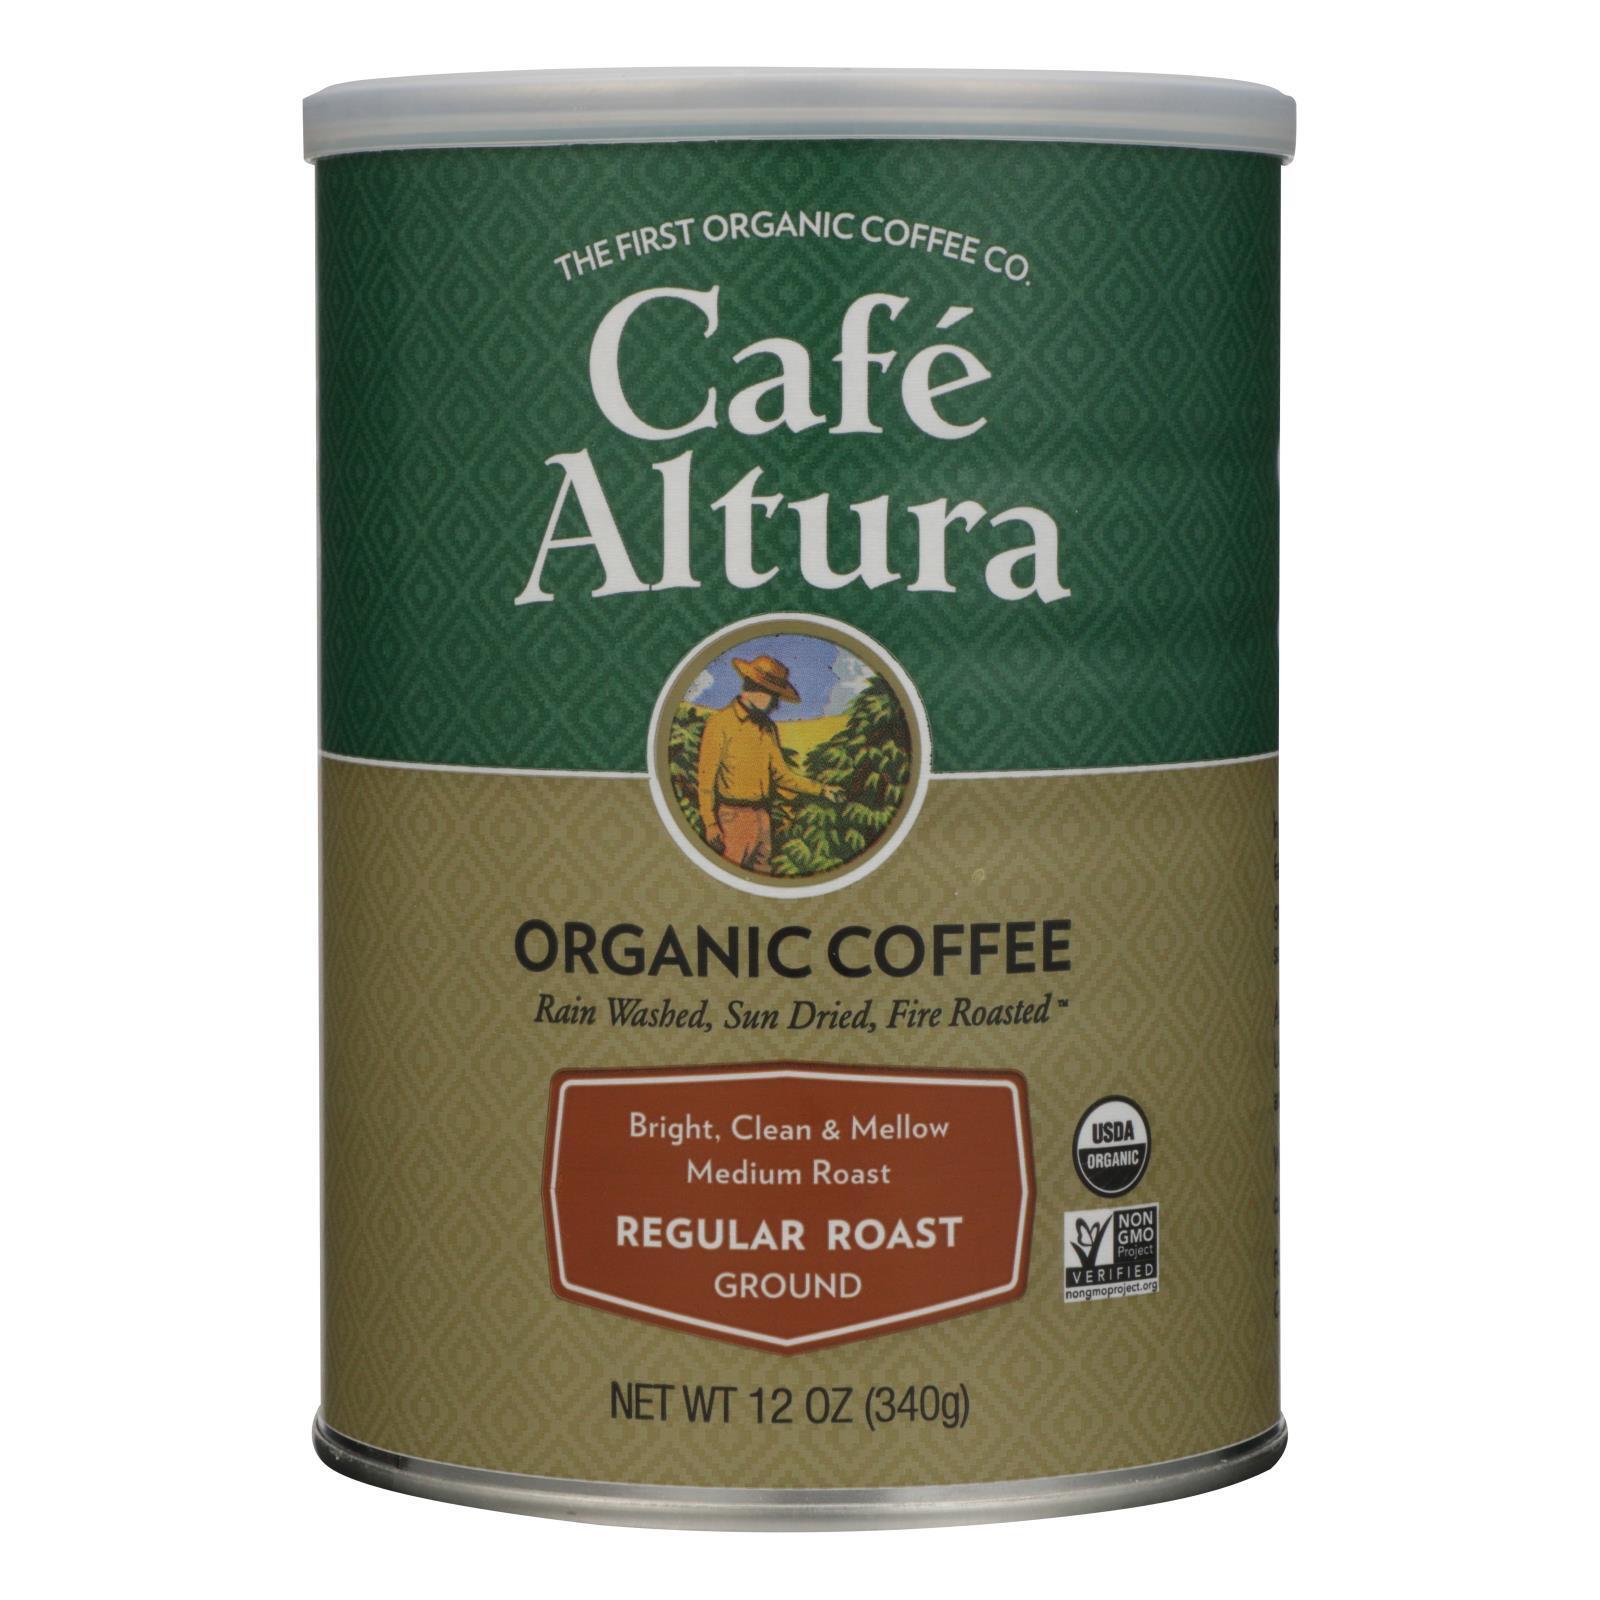 Cafe Altura Organic Ground Coffee - Regular Roast - Case of 6 - 12 oz.